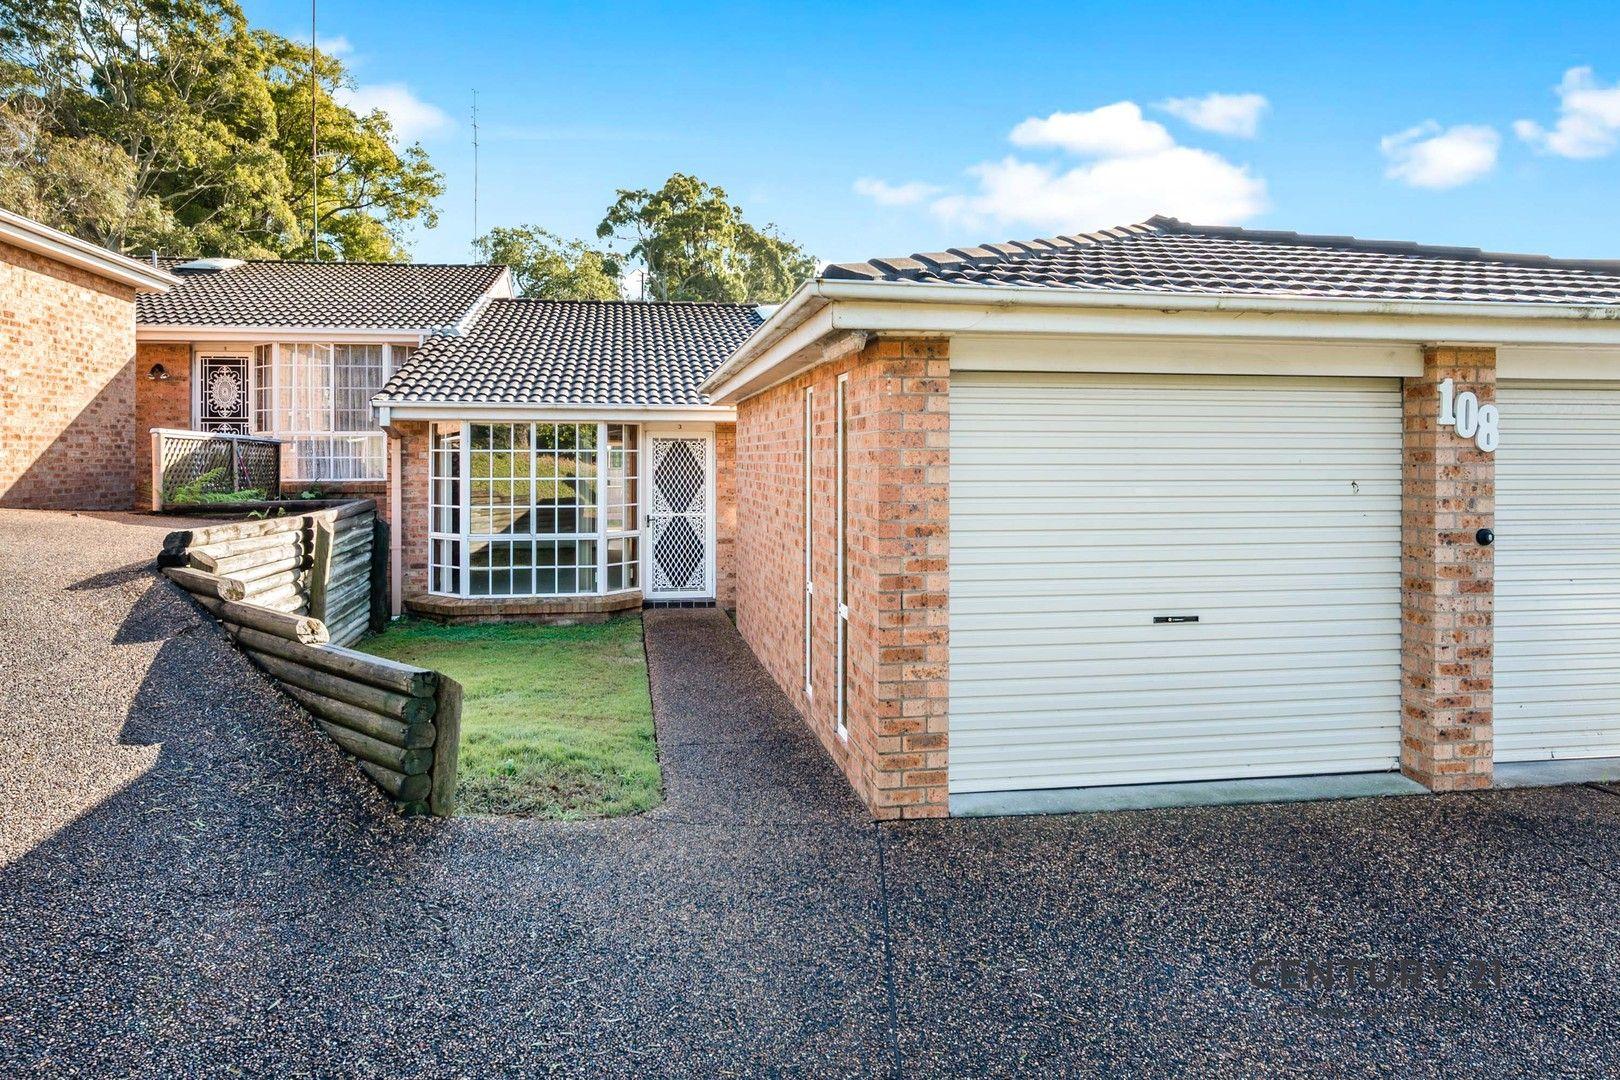 3/108 Kirkdale Drive, Charlestown NSW 2290, Image 0